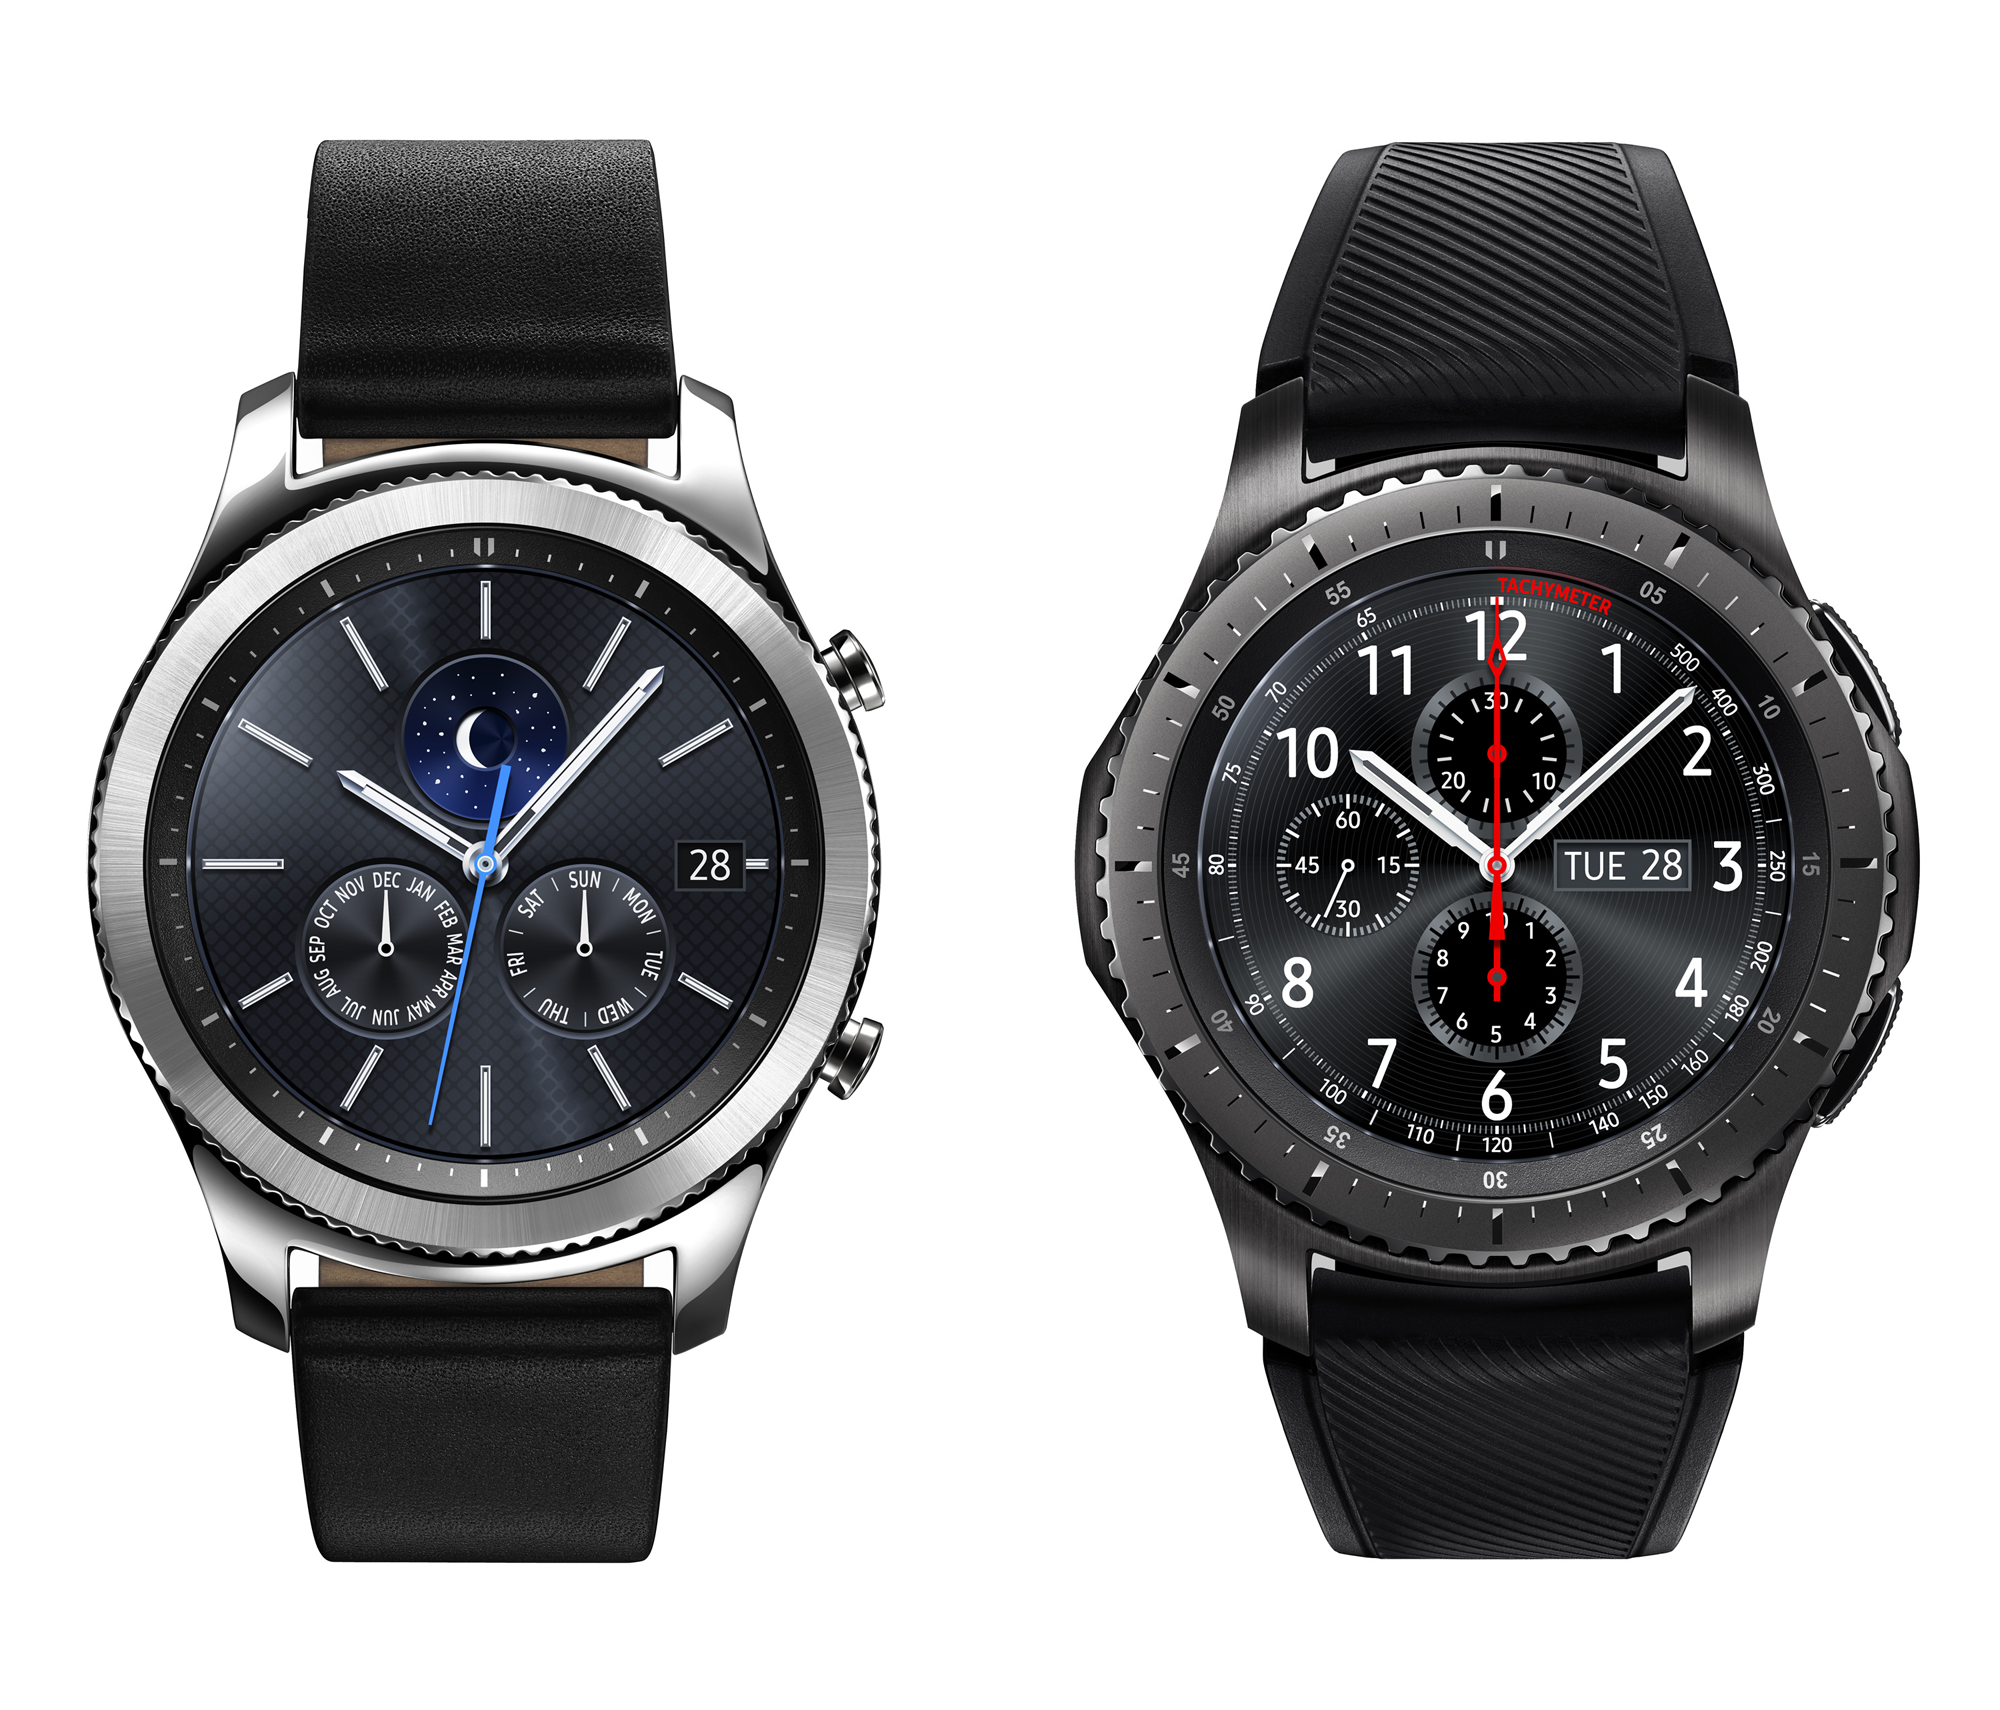 Samsung Gear S3 Specs Frontier Vs Classic Http Authoritywearables Com Samsung Gear S3 Specs Frontier V Samsung Smart Watch Smart Watch Samsung Gear Watch